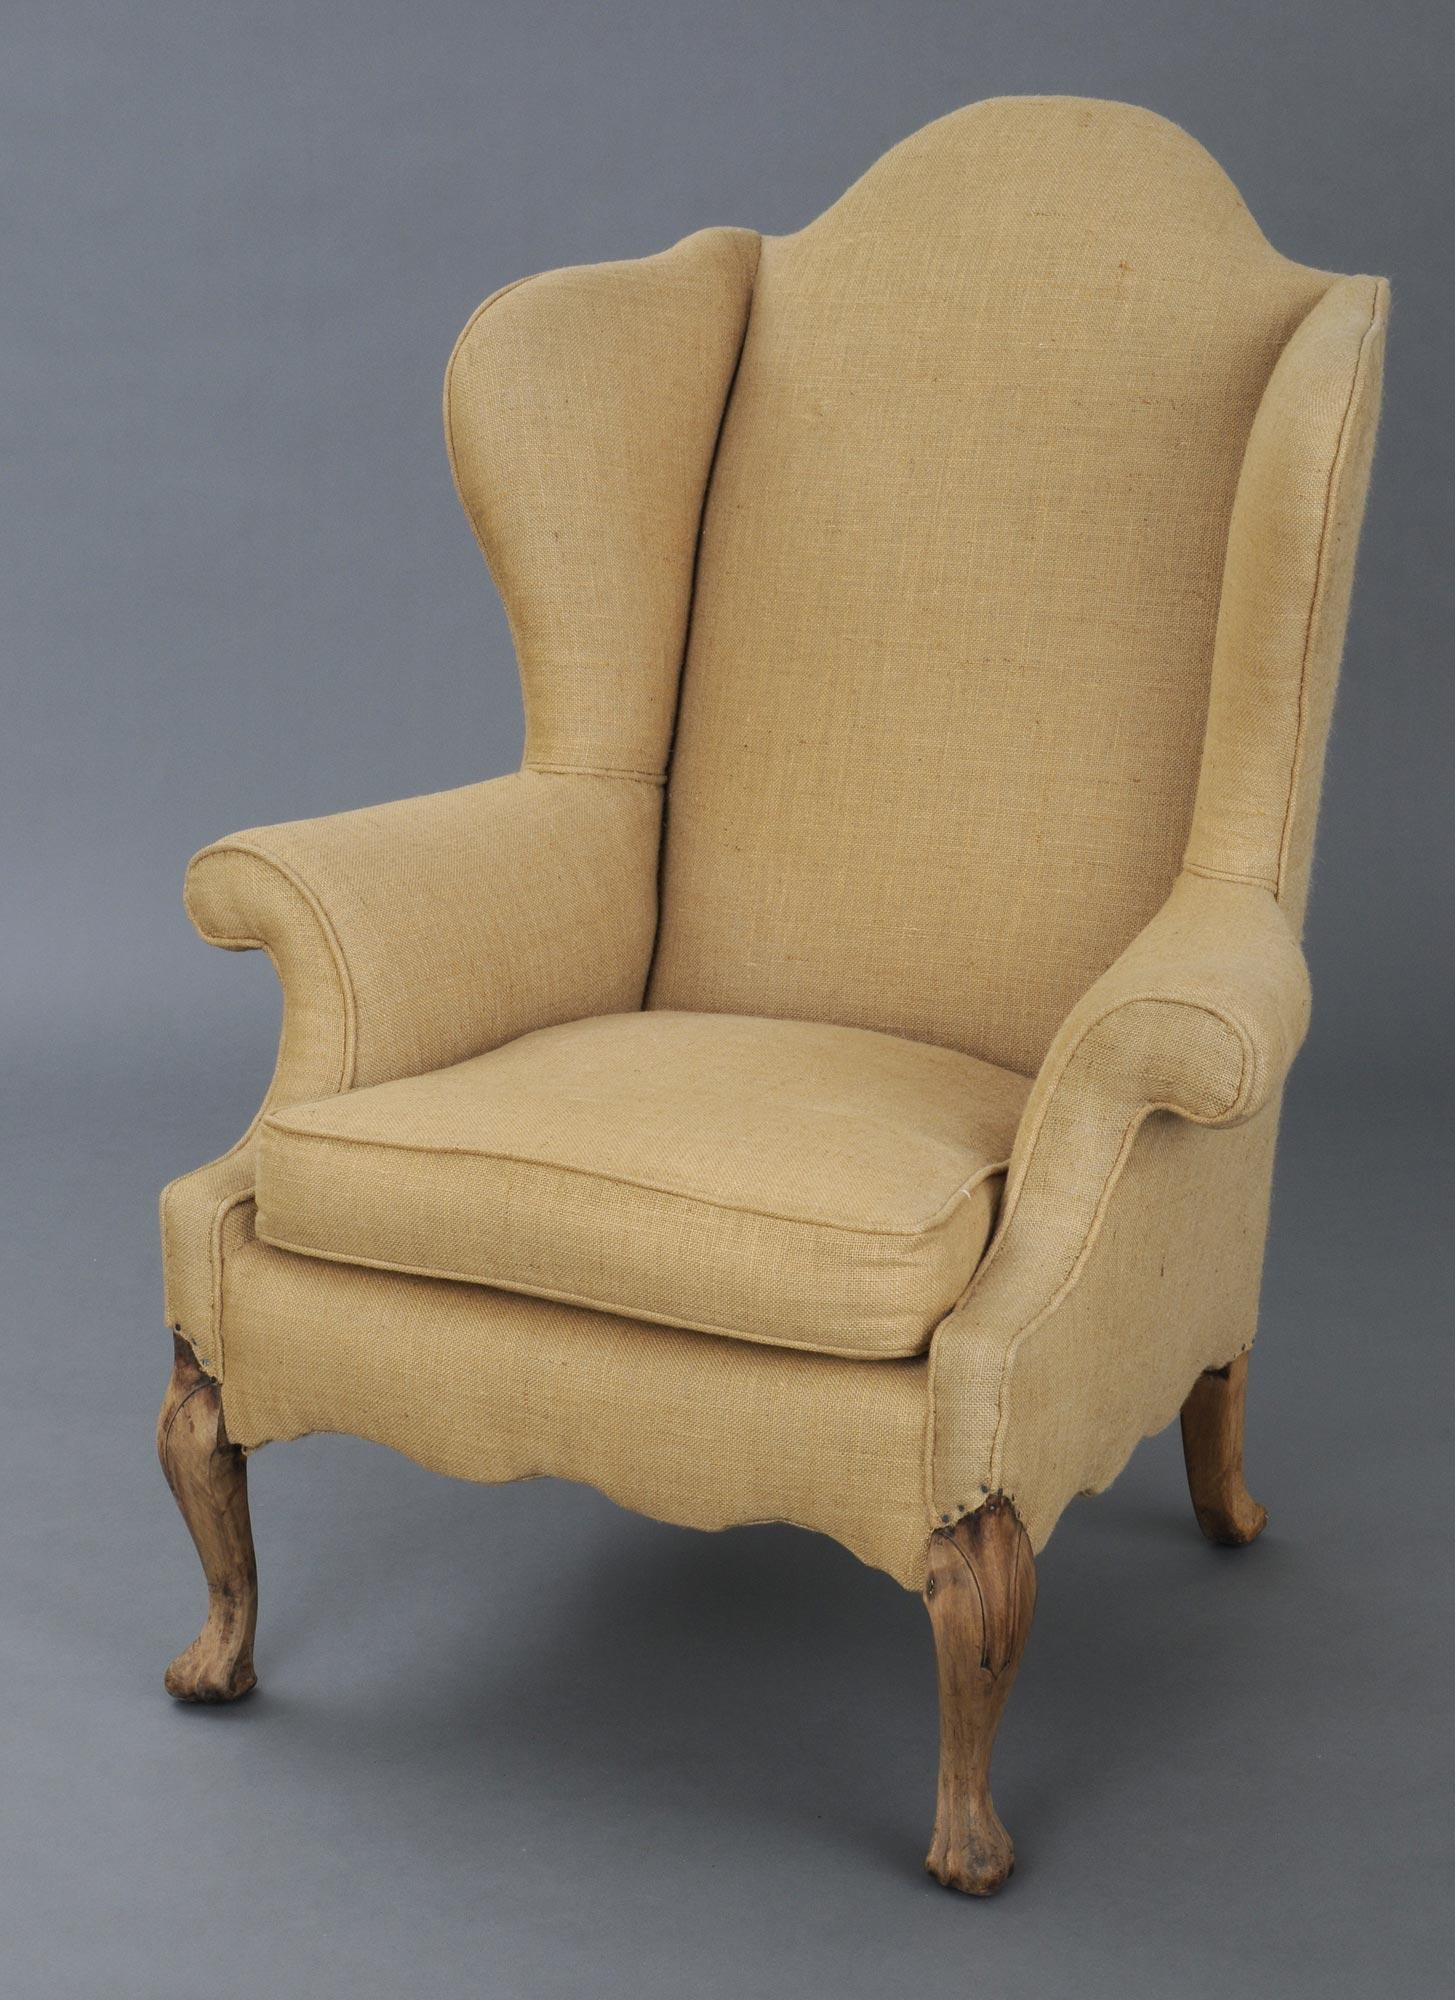 English Antique Georgian Walnut Wing Chair, Circa 1830 - Product » Georgian Wing Chair